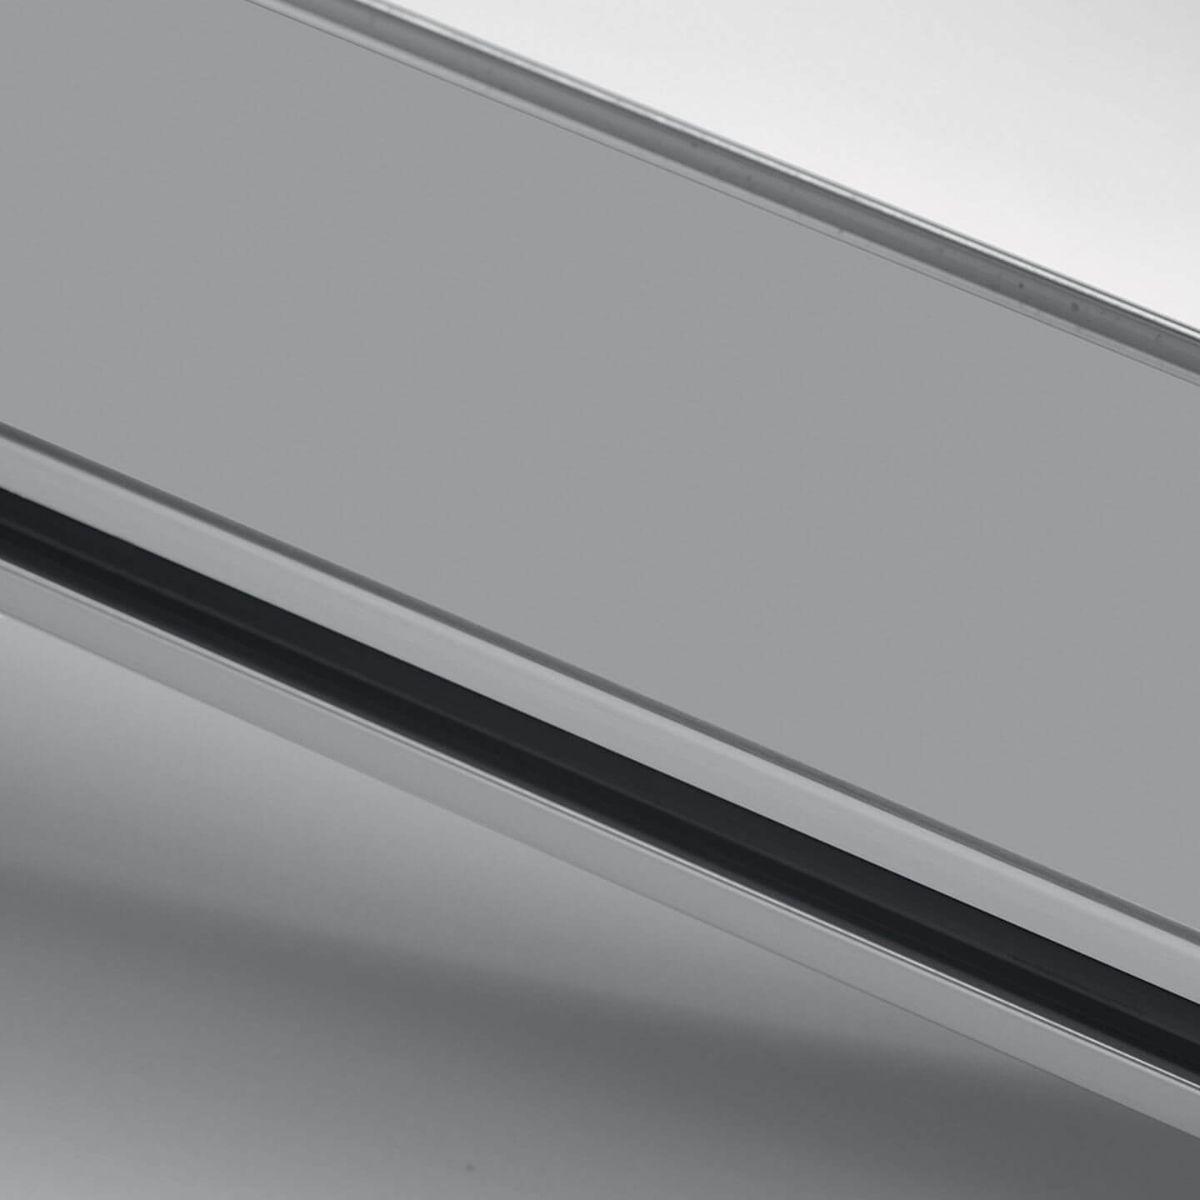 Anodized aluminium finish for glass walls